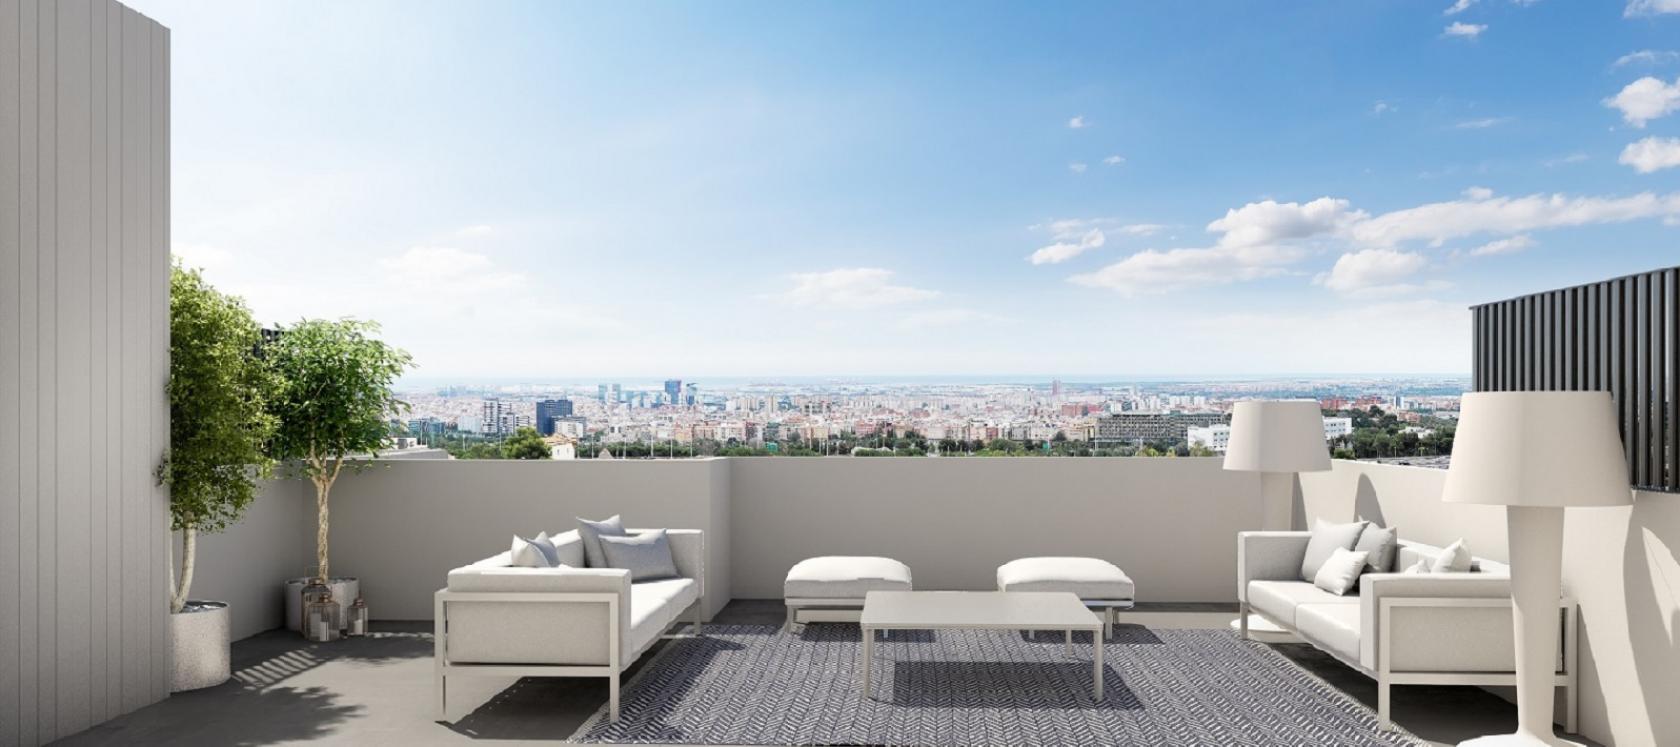 Obra nueva en Barcelona | Célere Finestrelles terraza